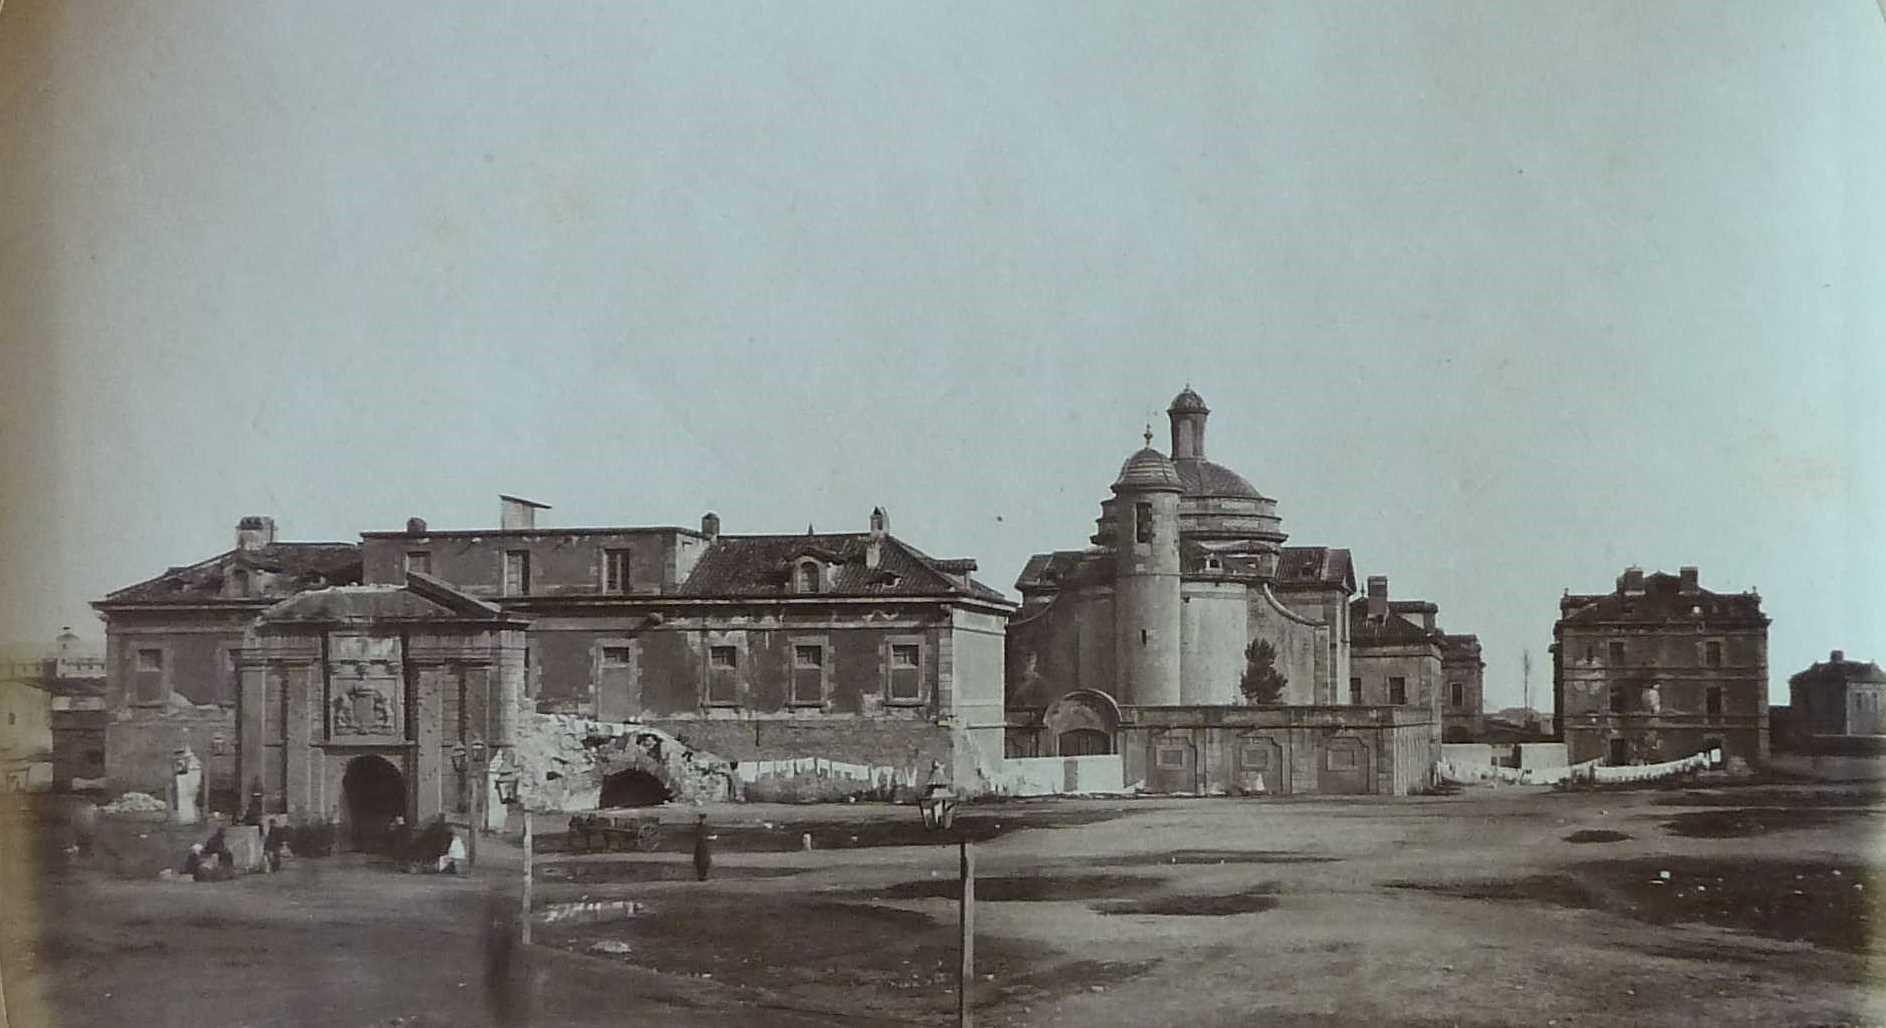 The Ciutadella fort